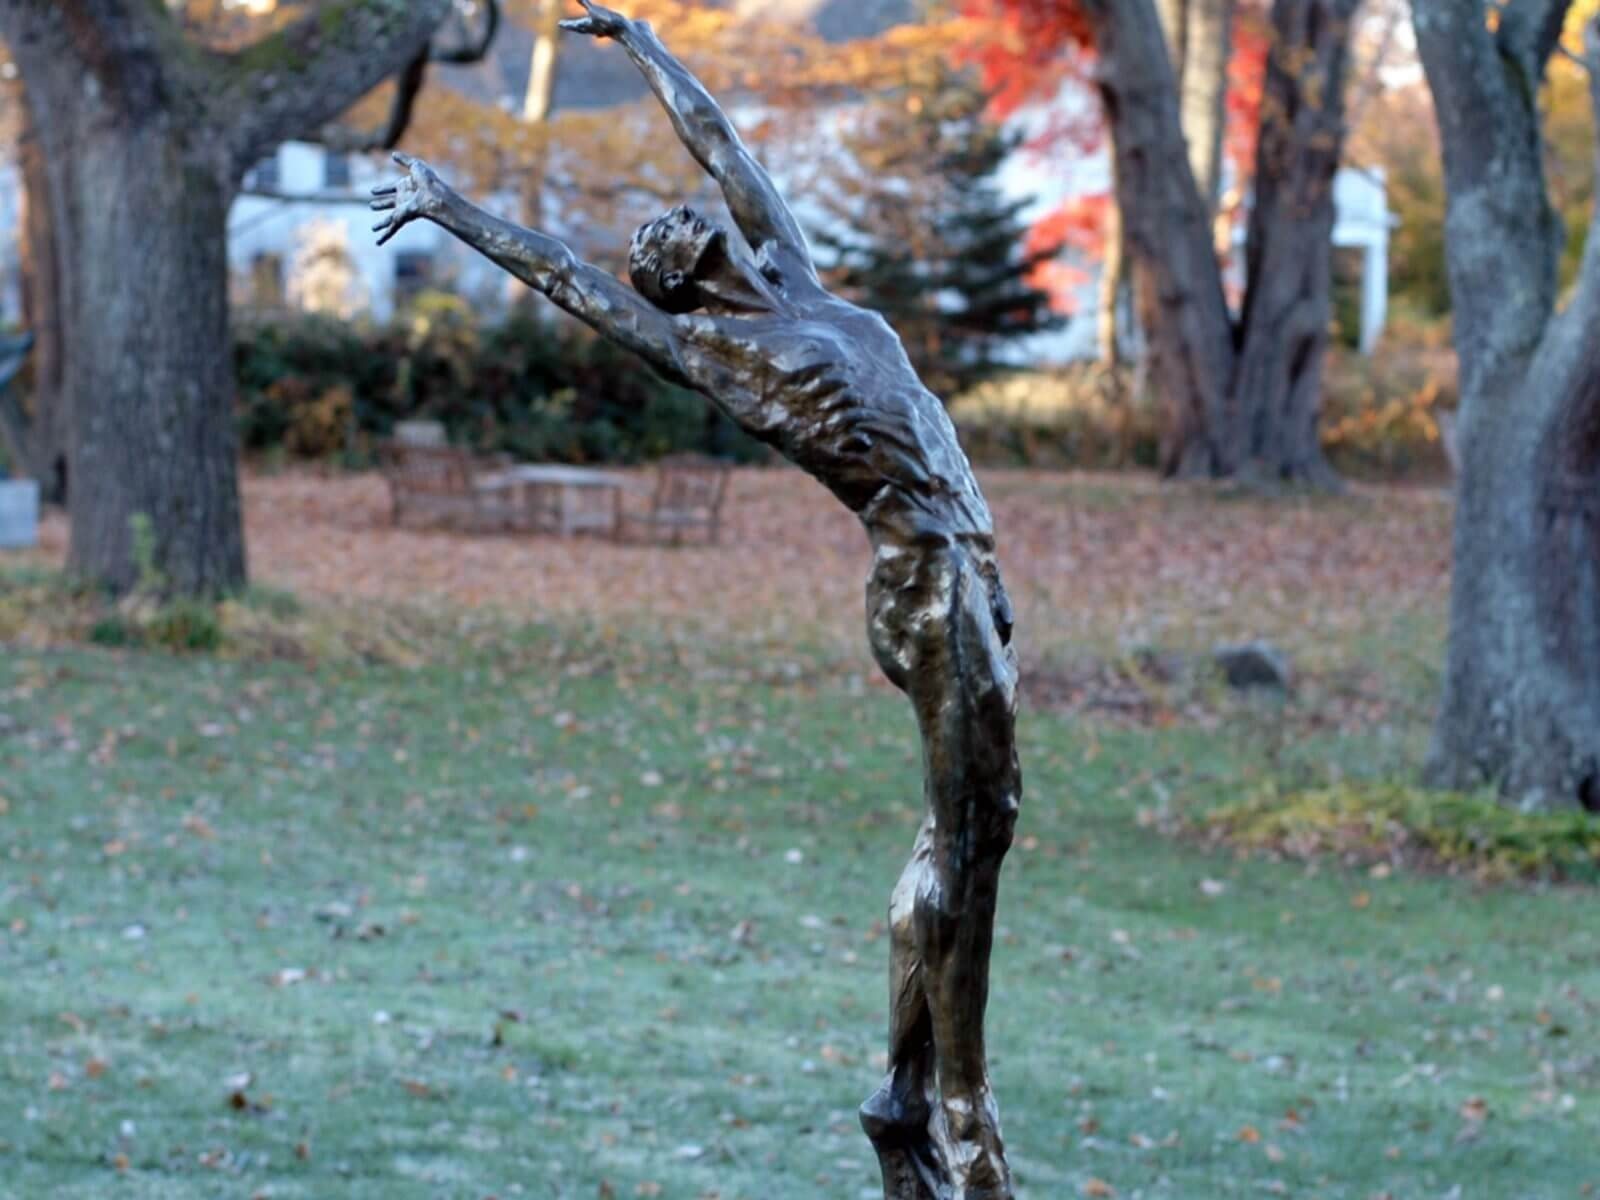 Dance of Morning a half life size Bronze male dancer Figurative Outdoor Garden Sculpture by Andrew DeVries